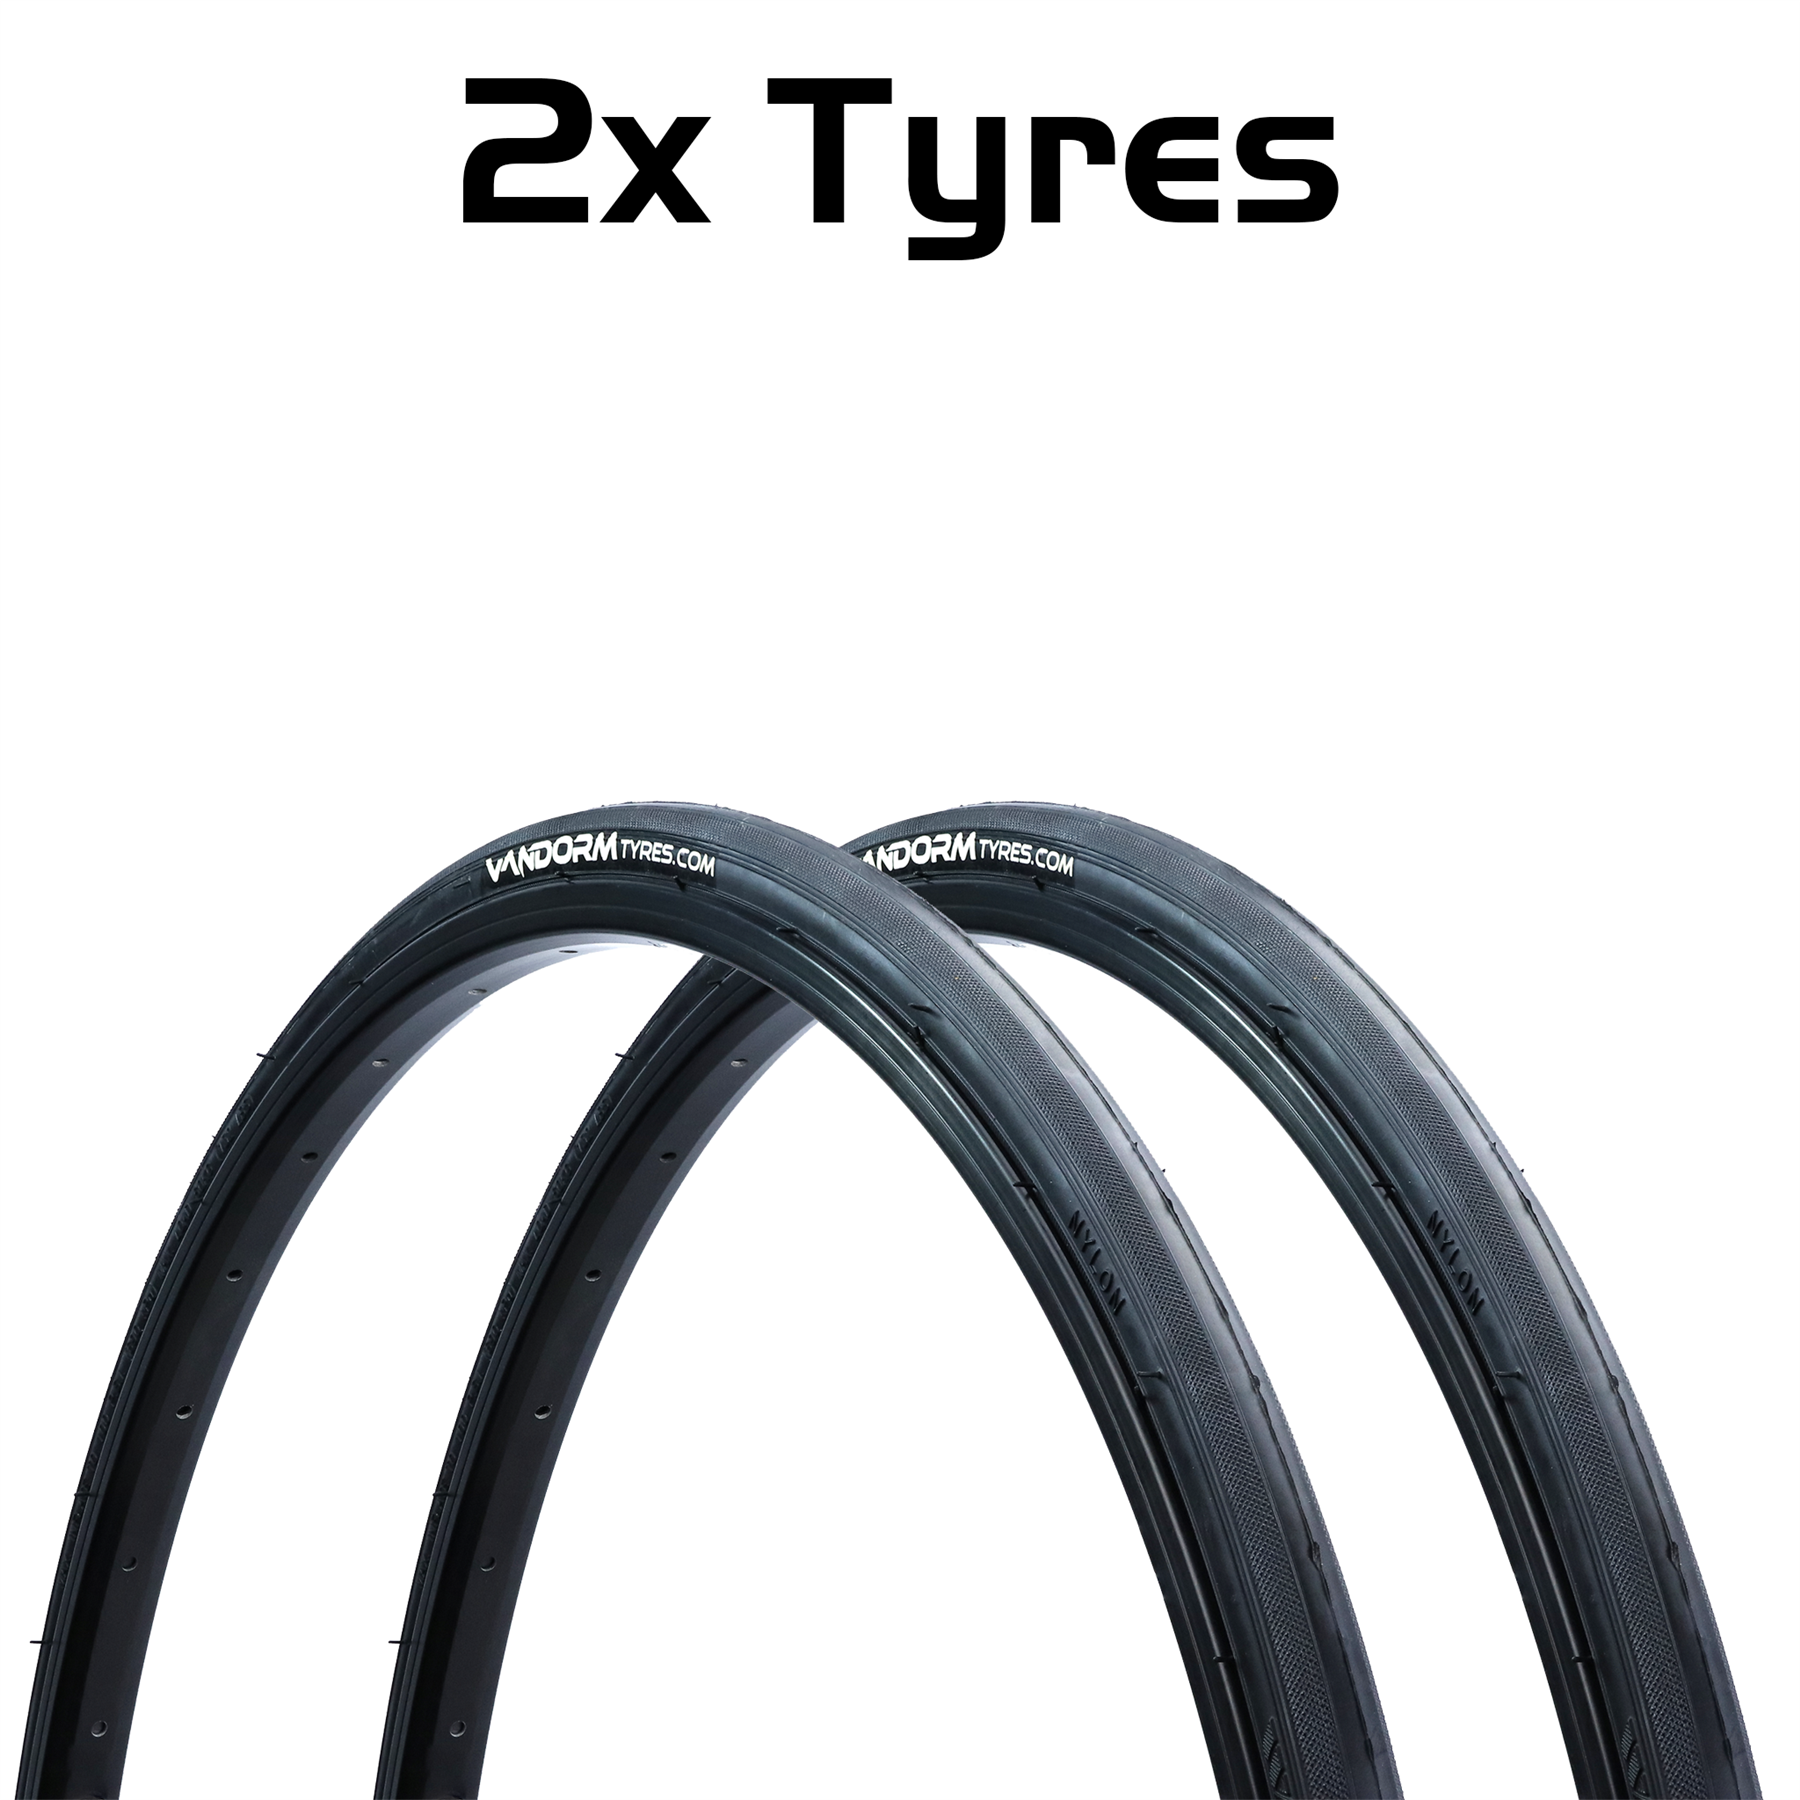 miniatuur 3 - Vandorm 700 x 23c SPEED 3 Colour Road Bike Fixie Tyres & Tube DEAL OPTIONS